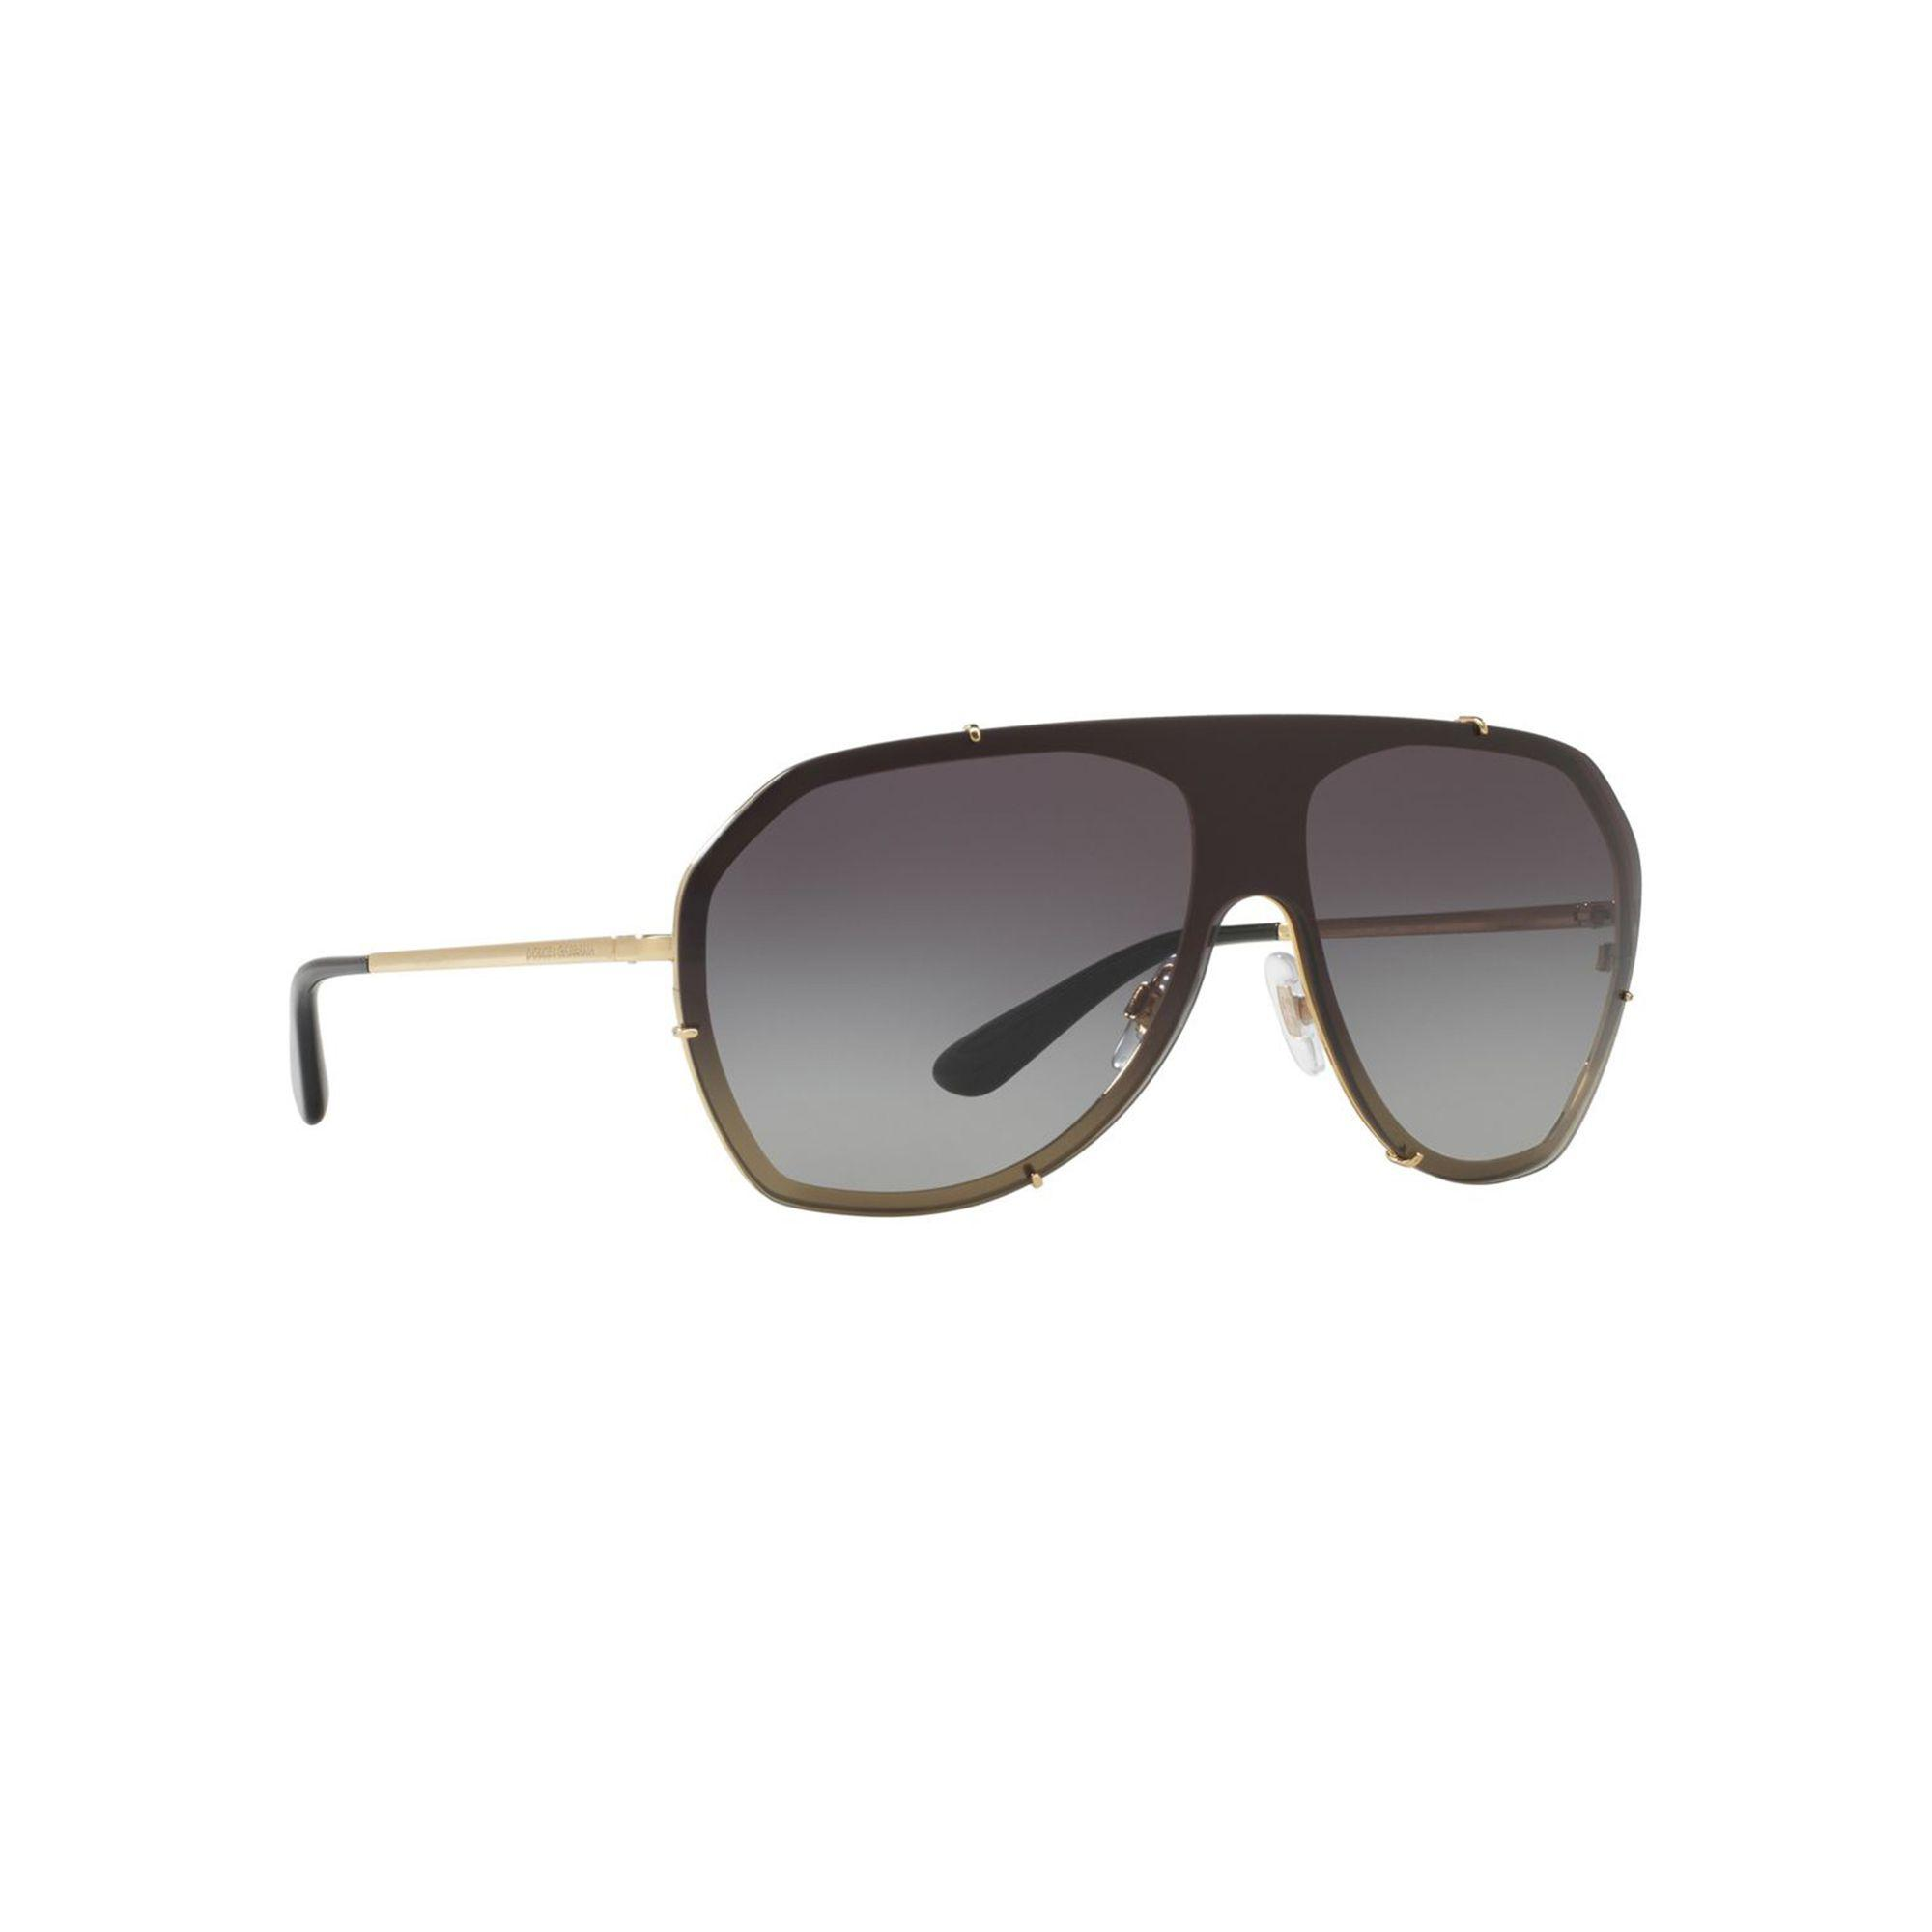 9ba6cddc9cf7 Dolce   Gabbana Gold Dg2162 Pilot Sunglasses in Metallic - Lyst